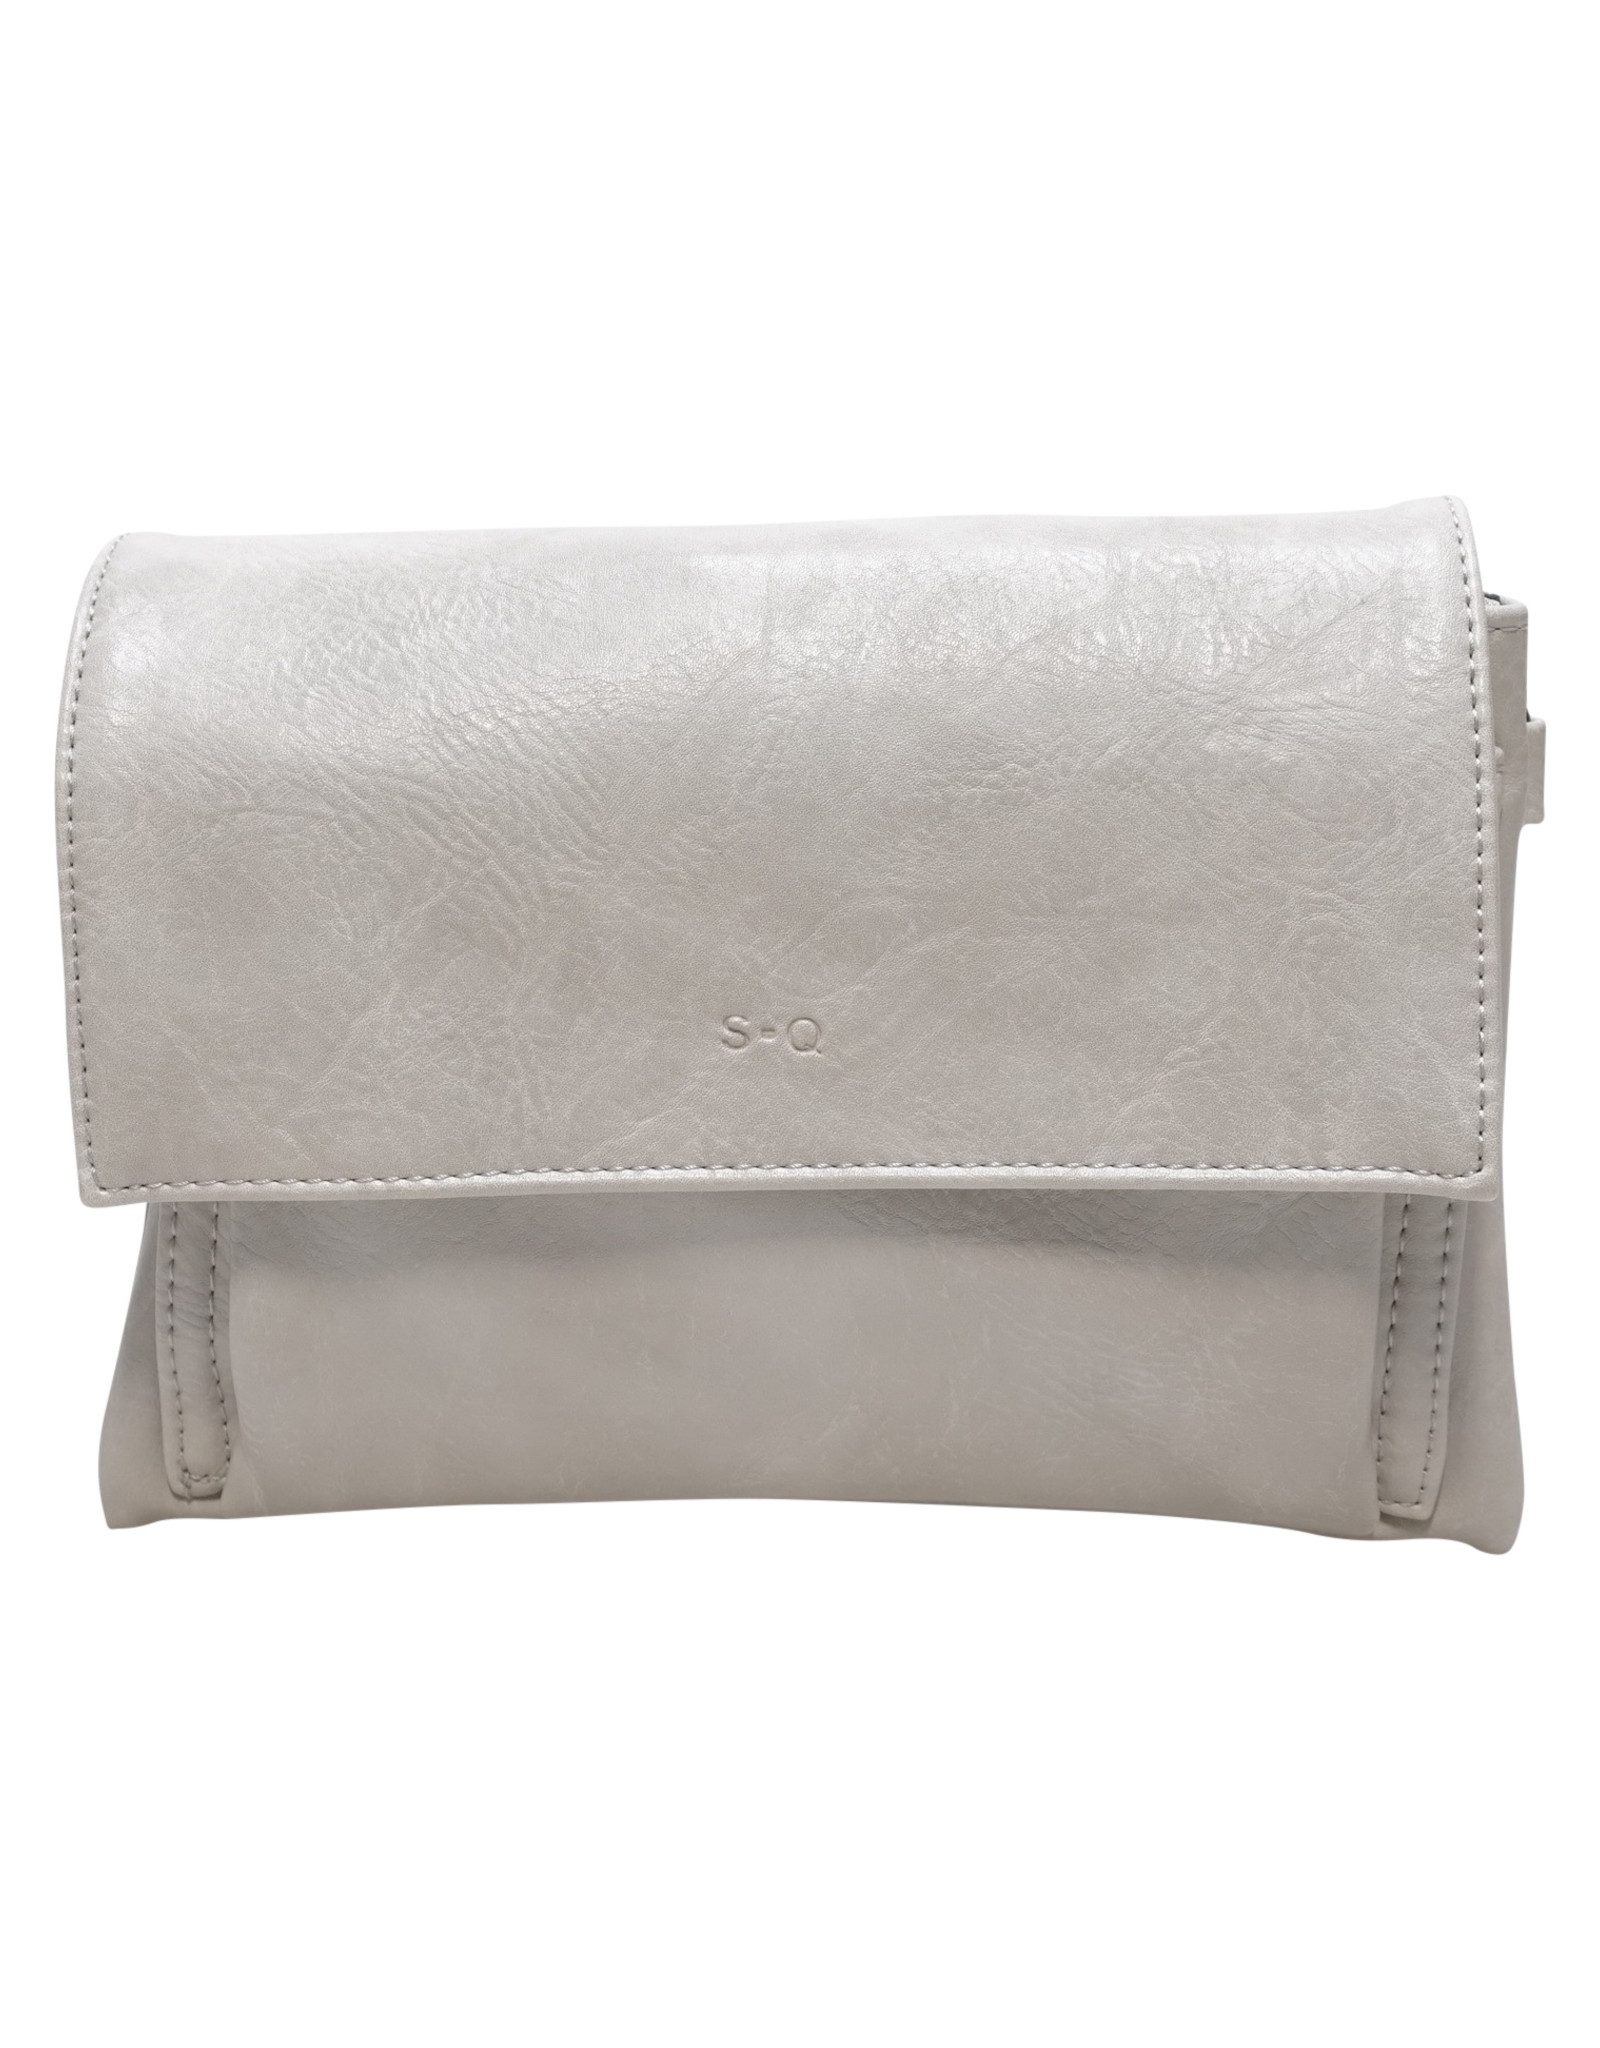 Antique White Mandy Belt Bag